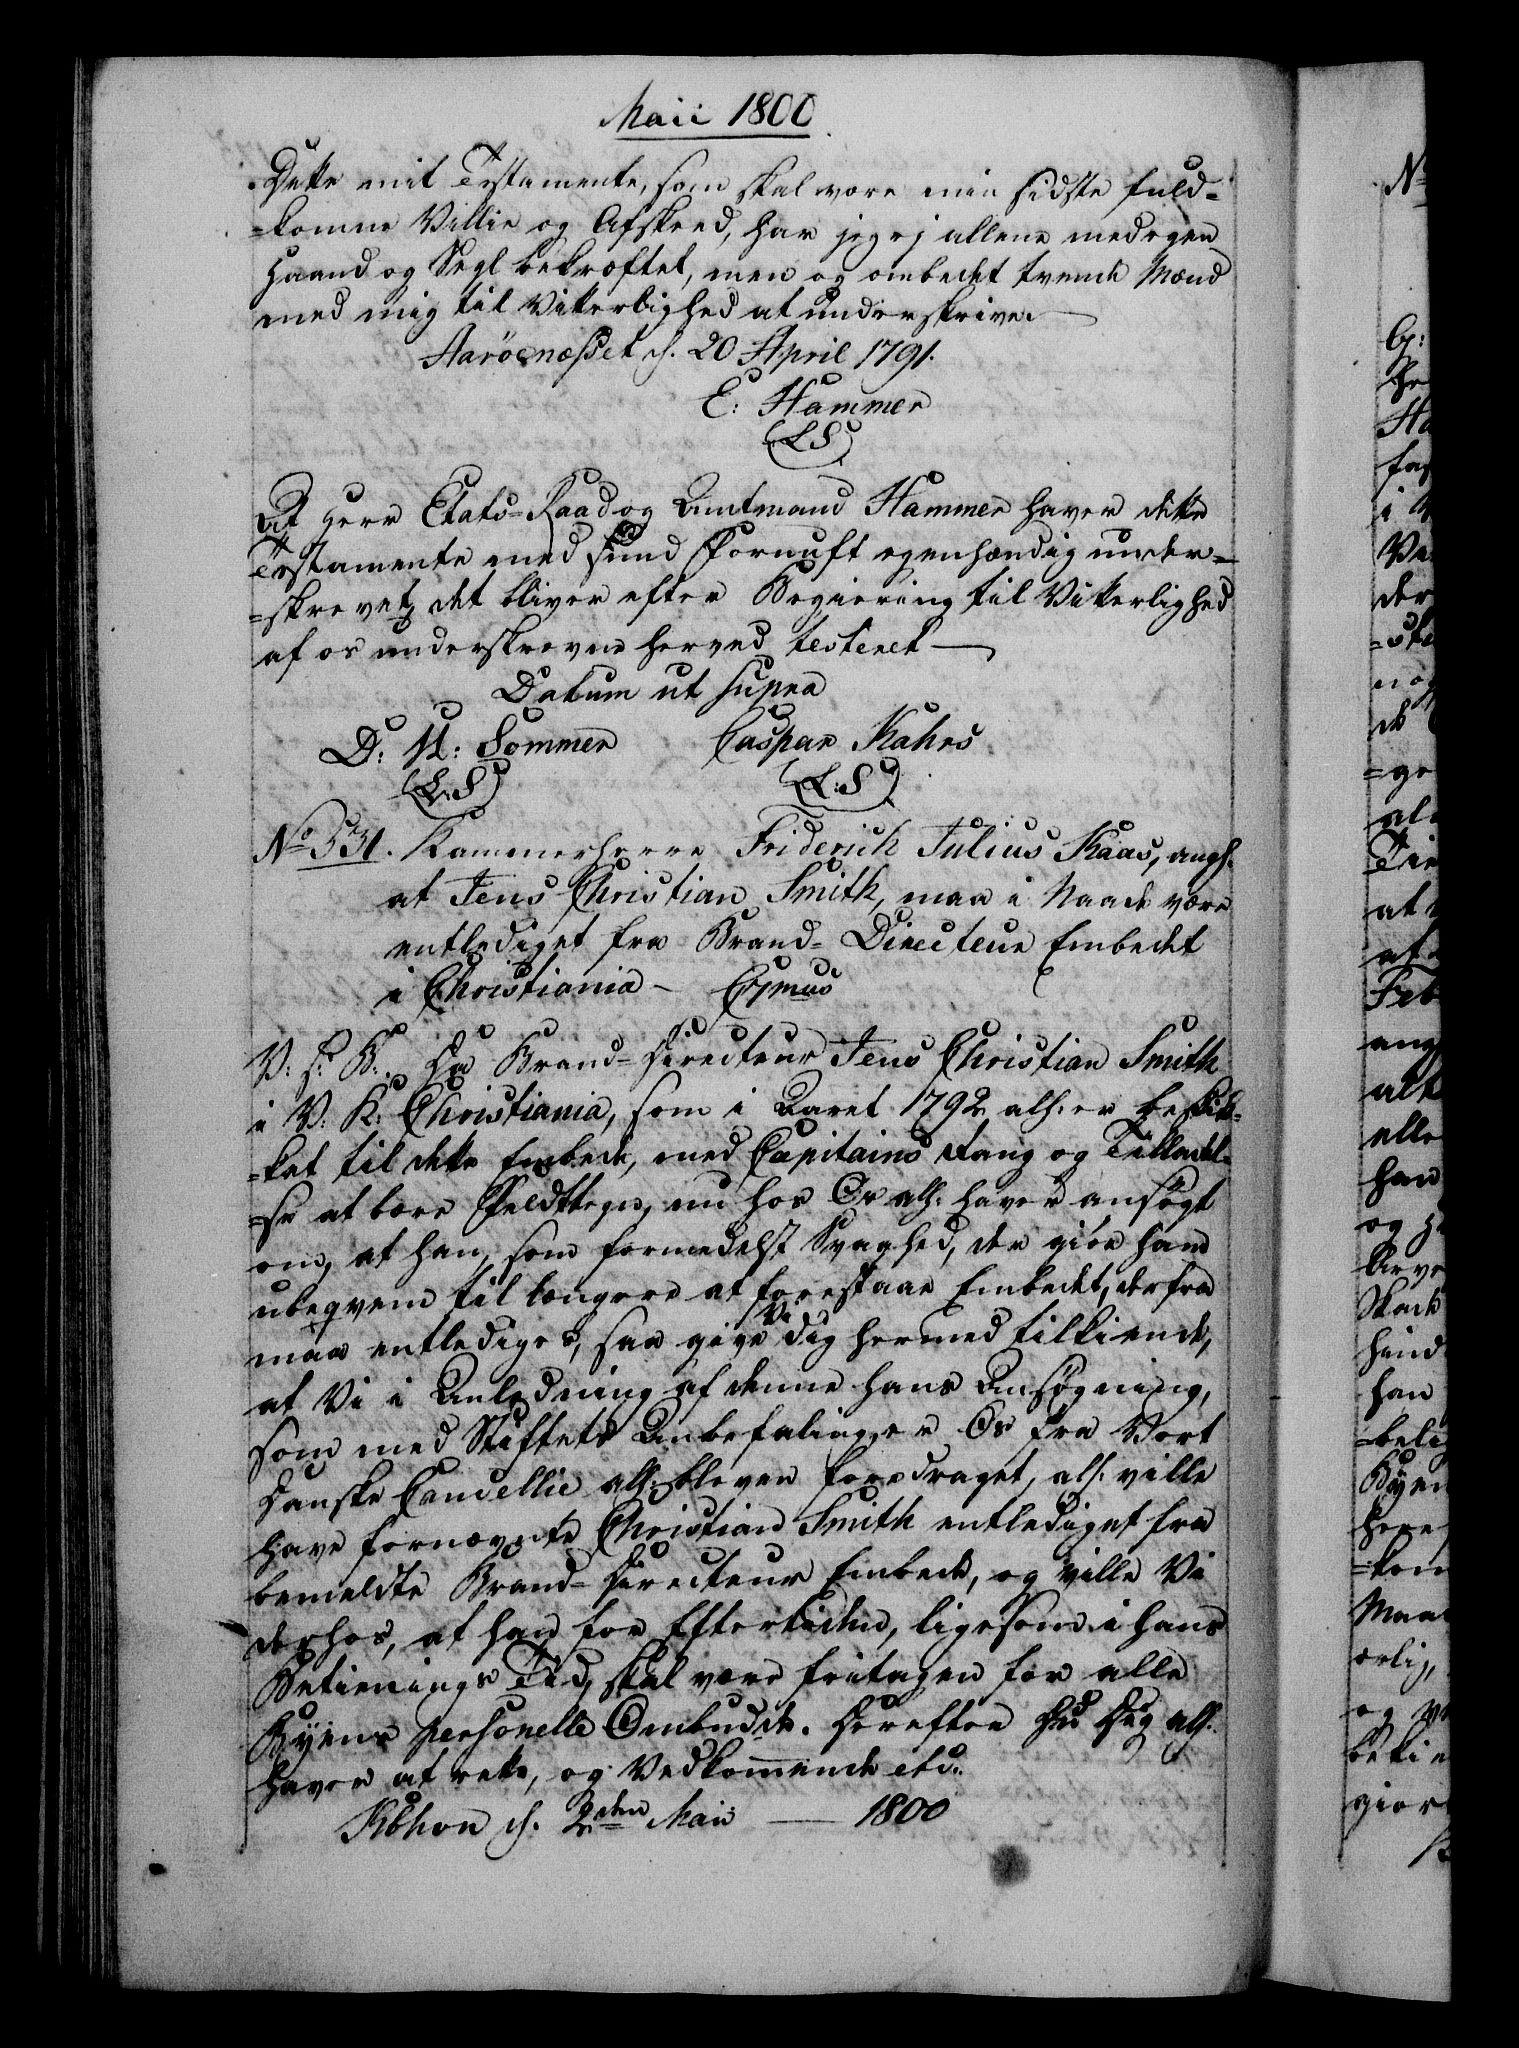 RA, Danske Kanselli 1800-1814, H/Hf/Hfb/Hfba/L0001: Registranter, 1800-1801, s. 175b